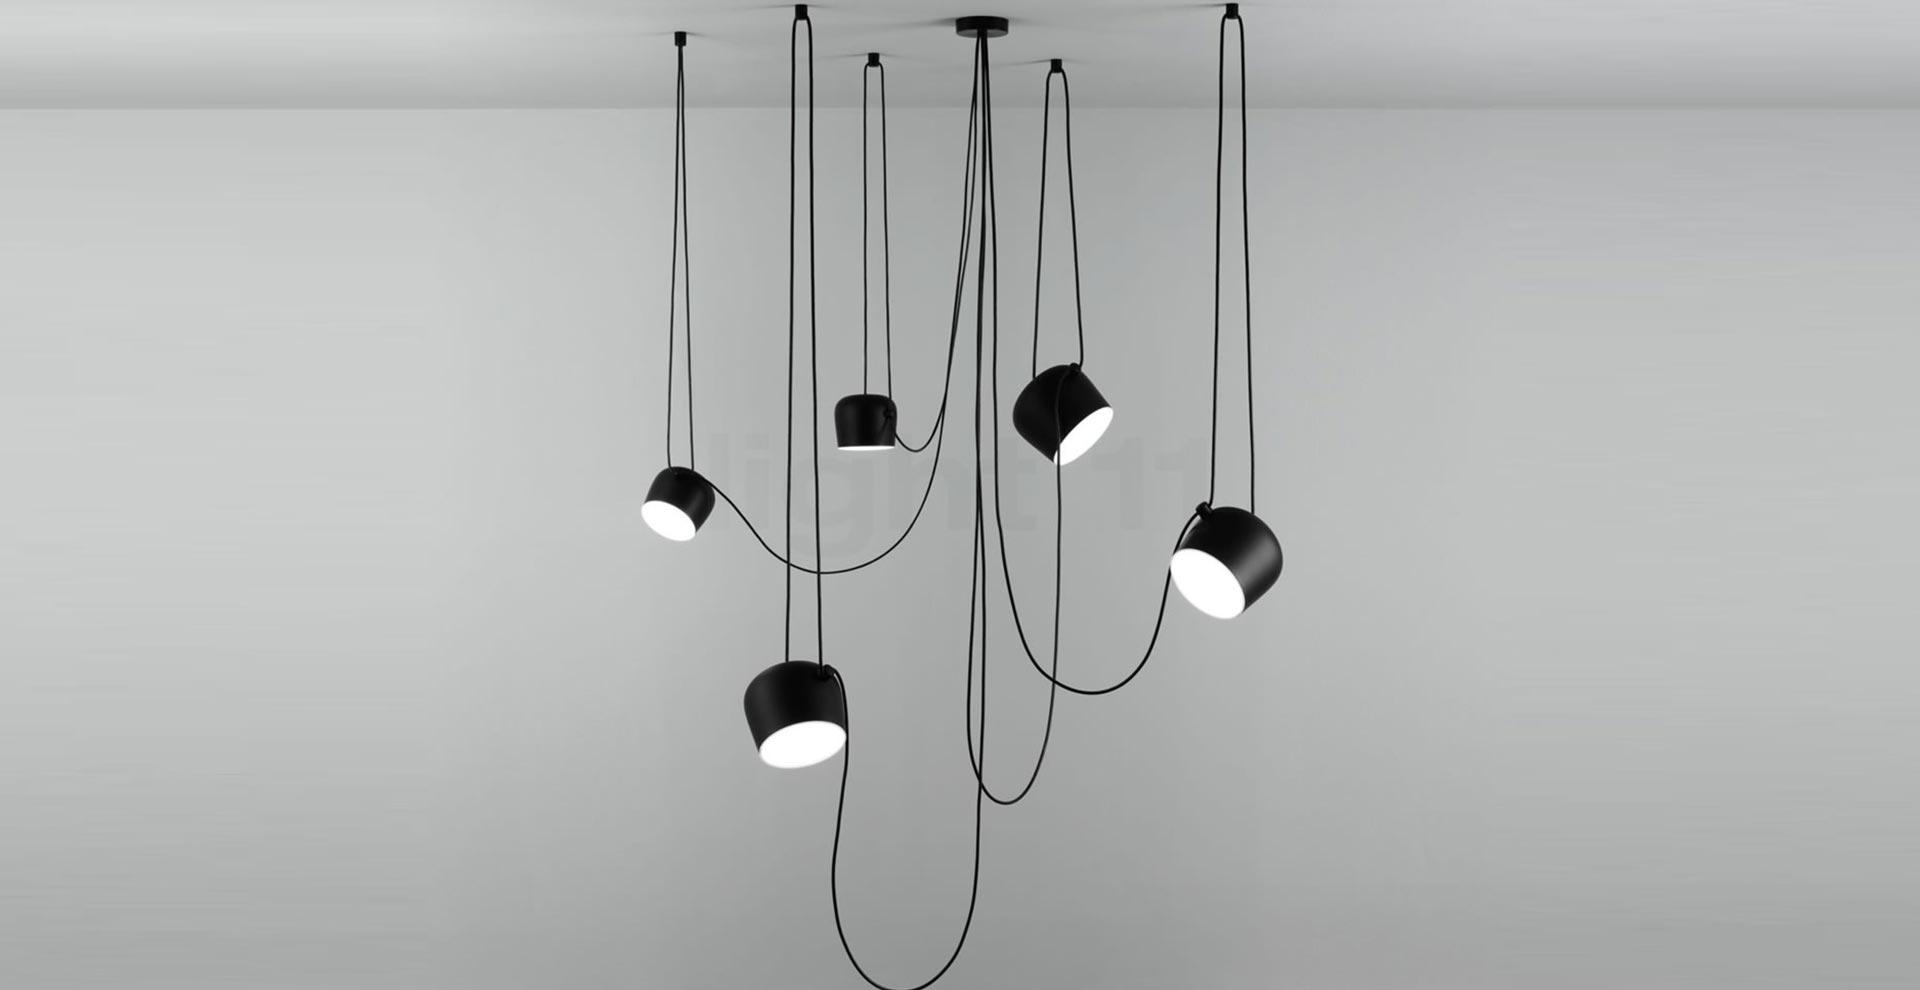 Aim flos lampada aim flos lampada a sospensione aim flos